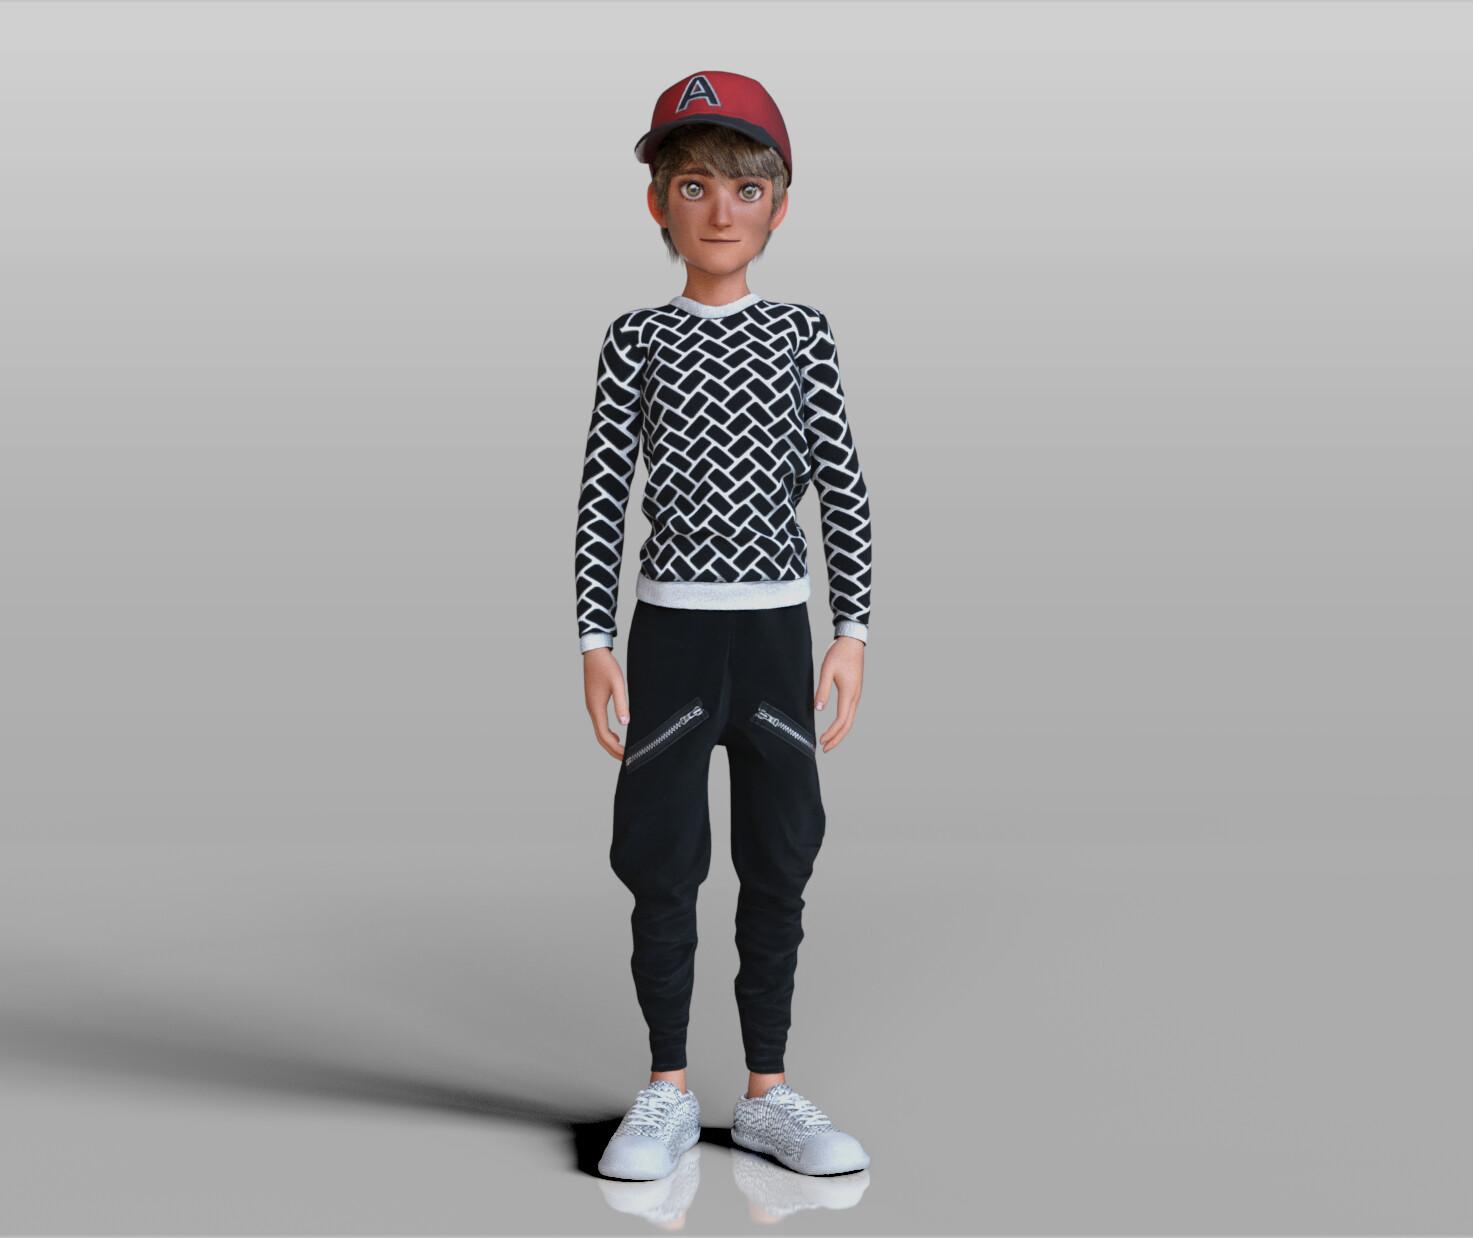 Tokomotion base neutral knitwear teaser02